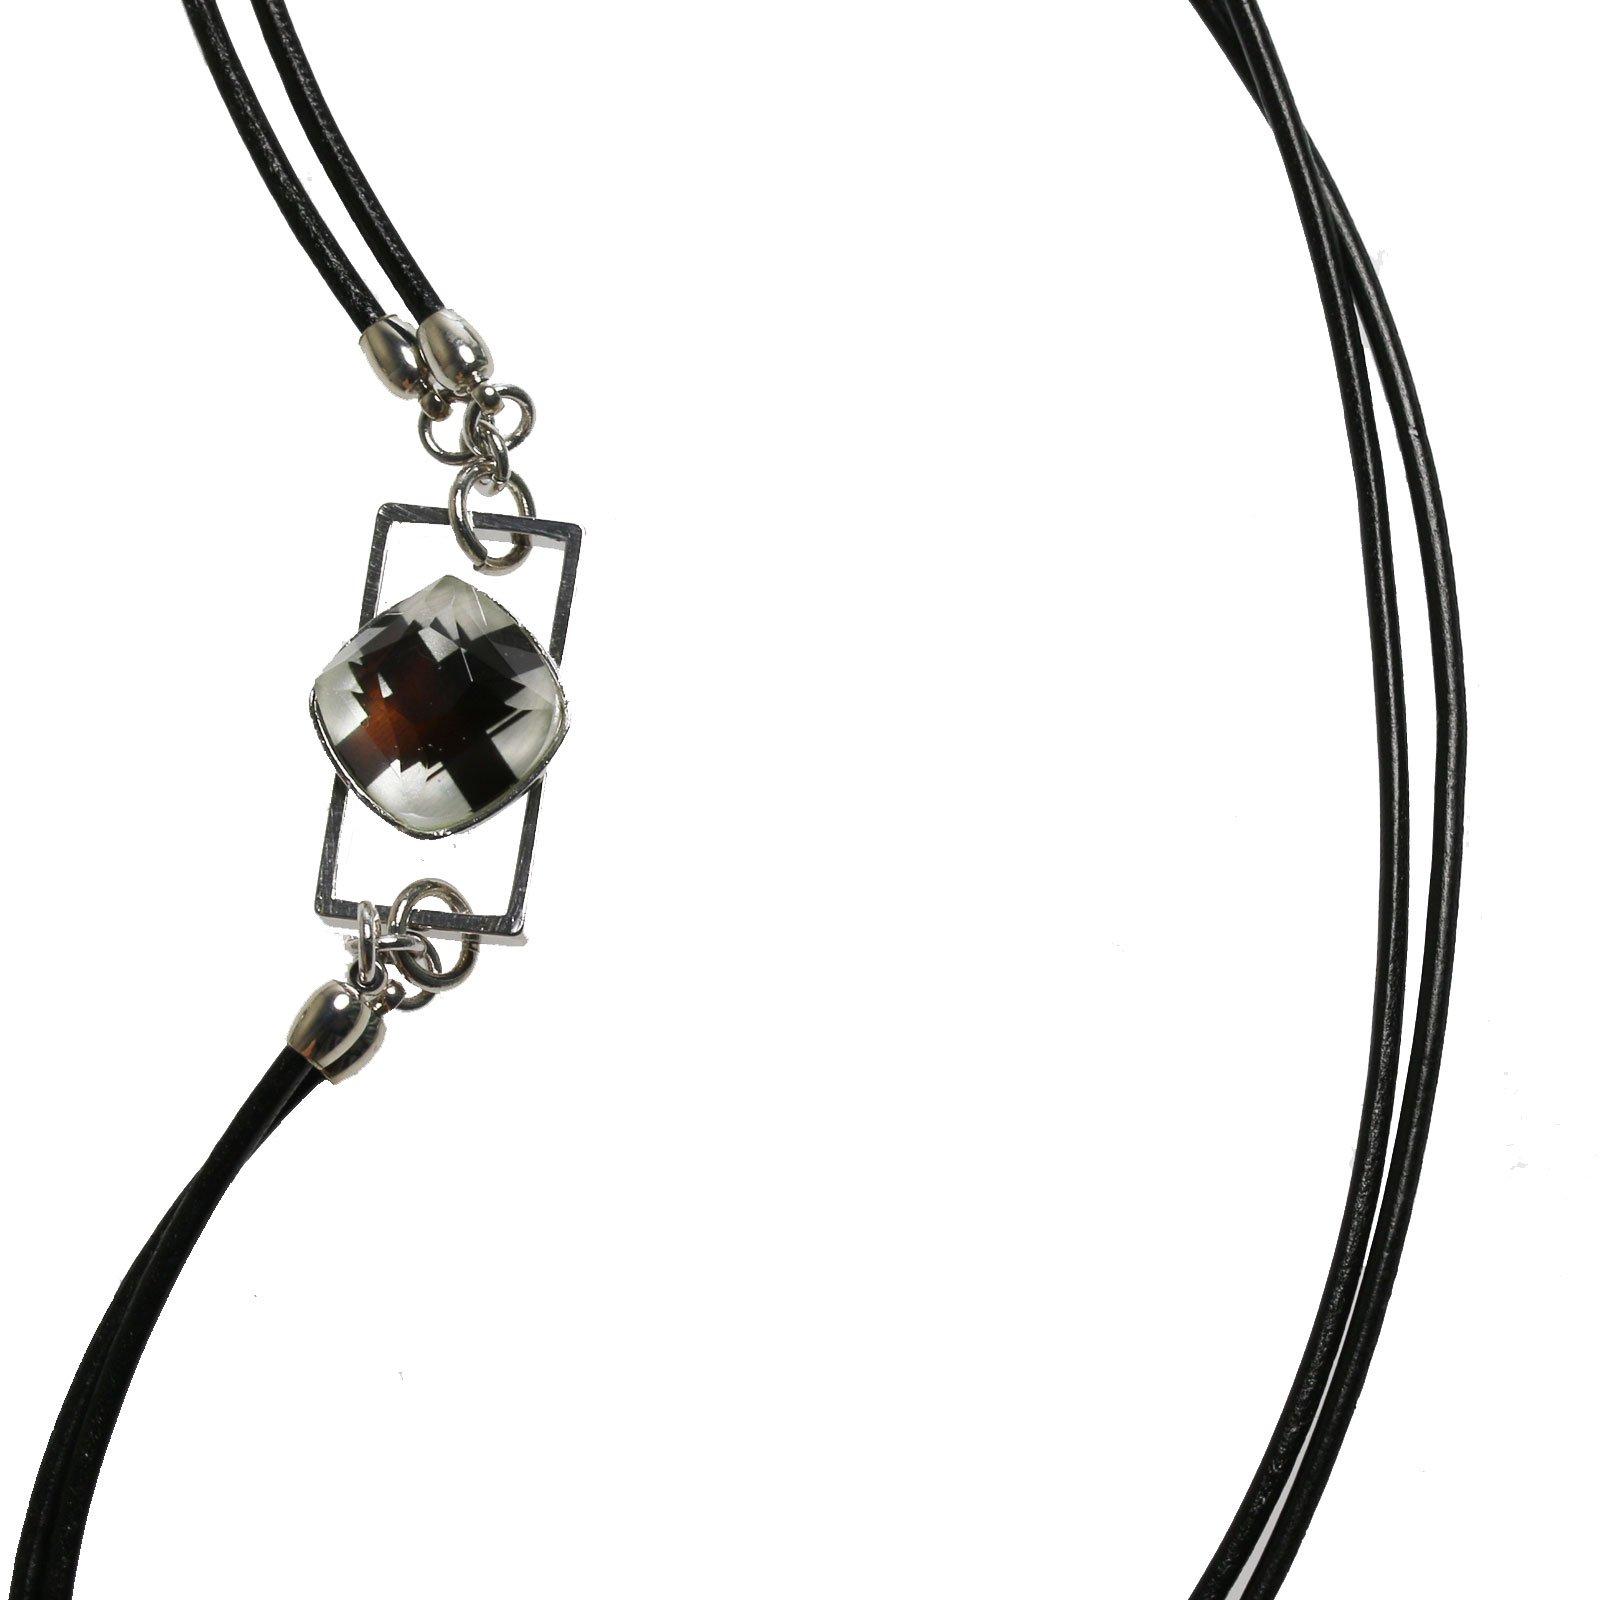 Tamarusan Eyeglass Holder Glasses Chain Leather Original Resin by TAMARUSAN